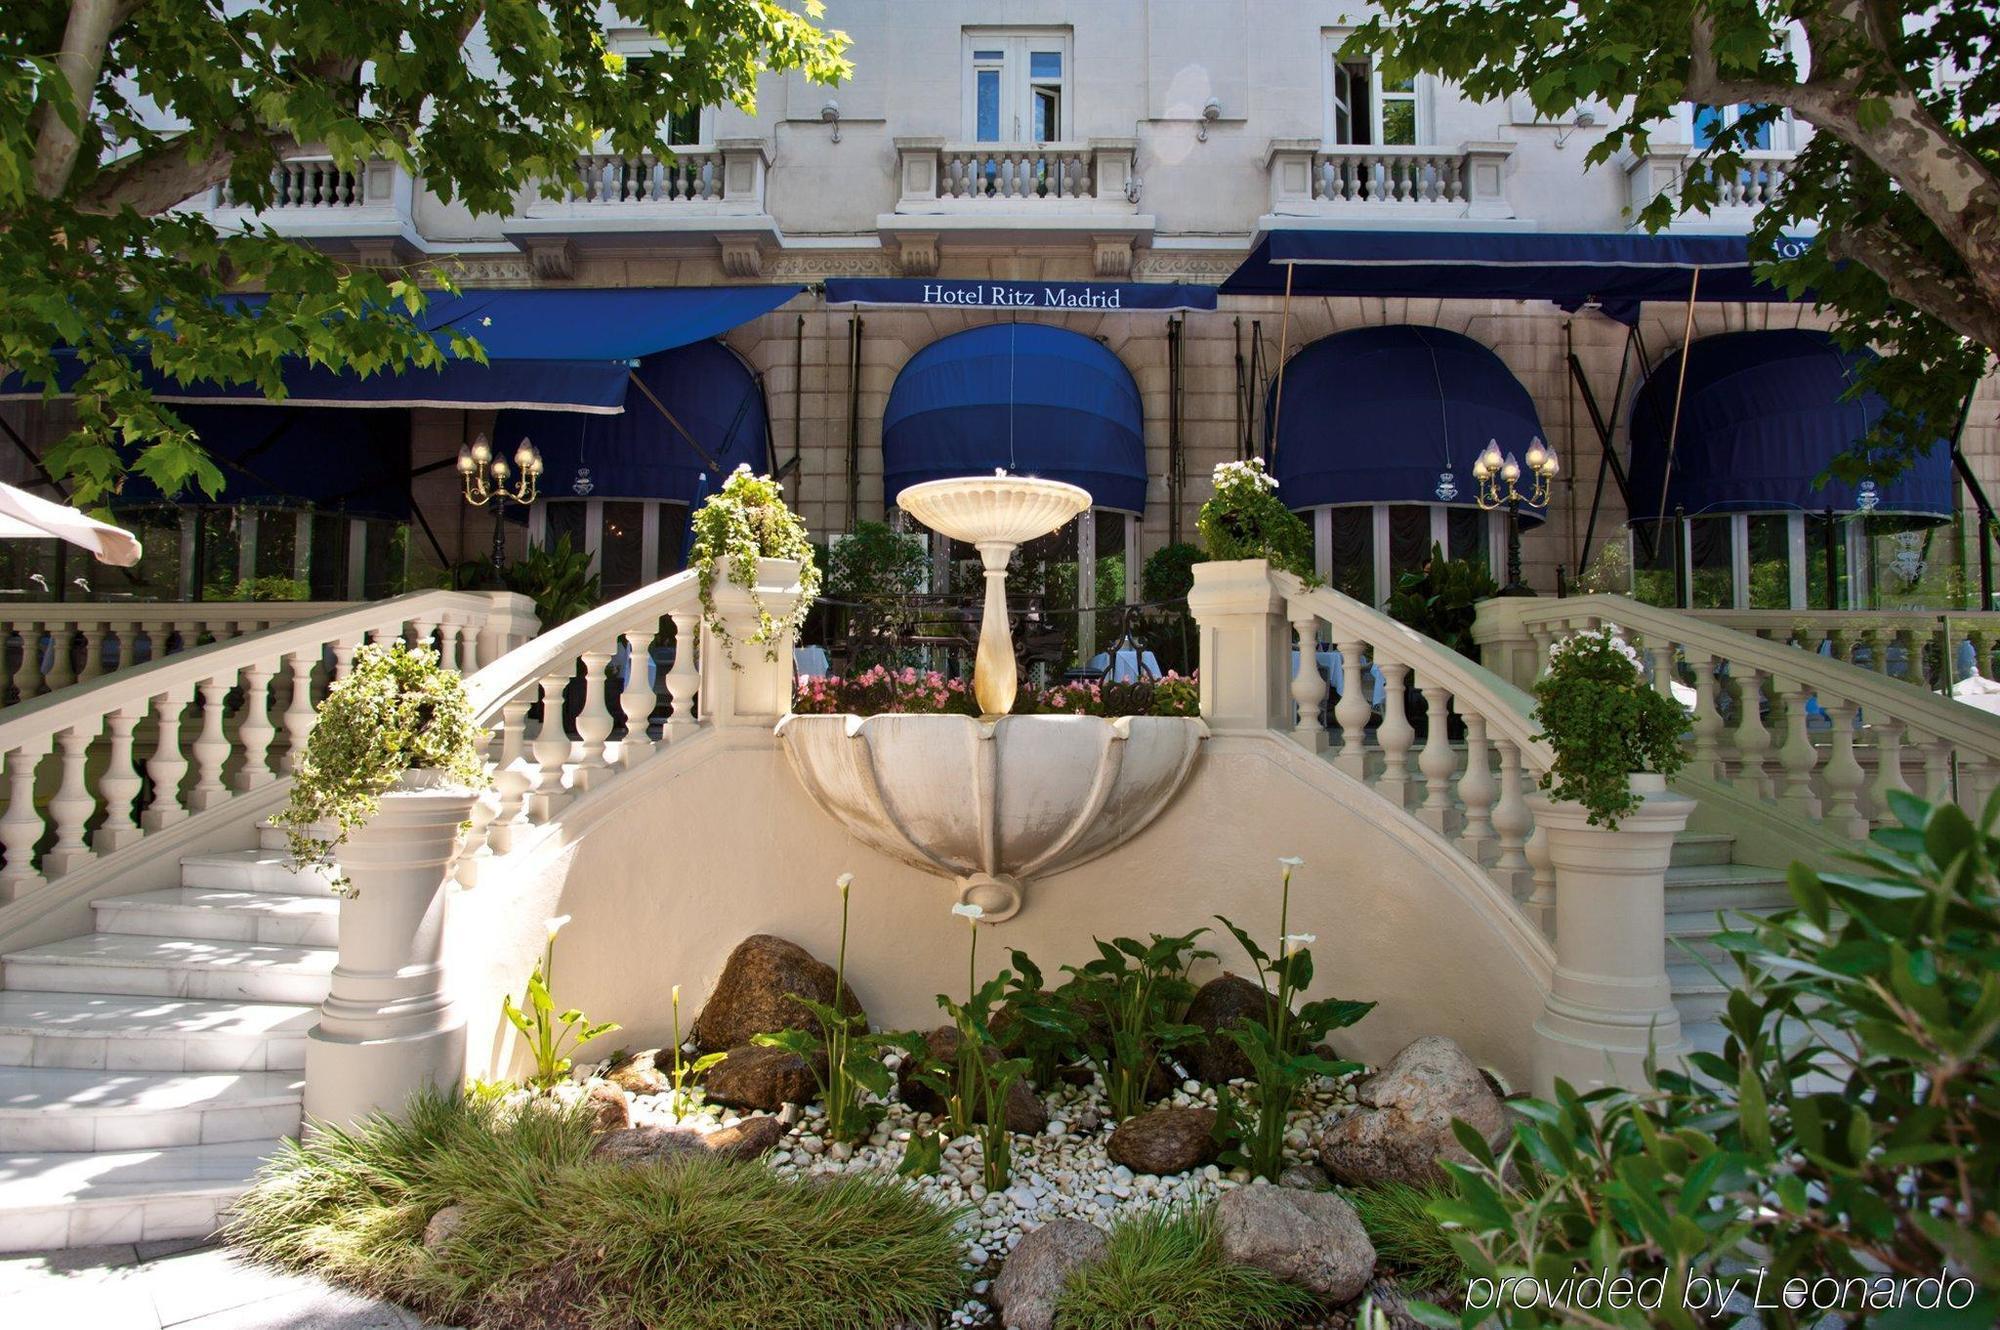 HOTEL RITZ MADRID, MADRID